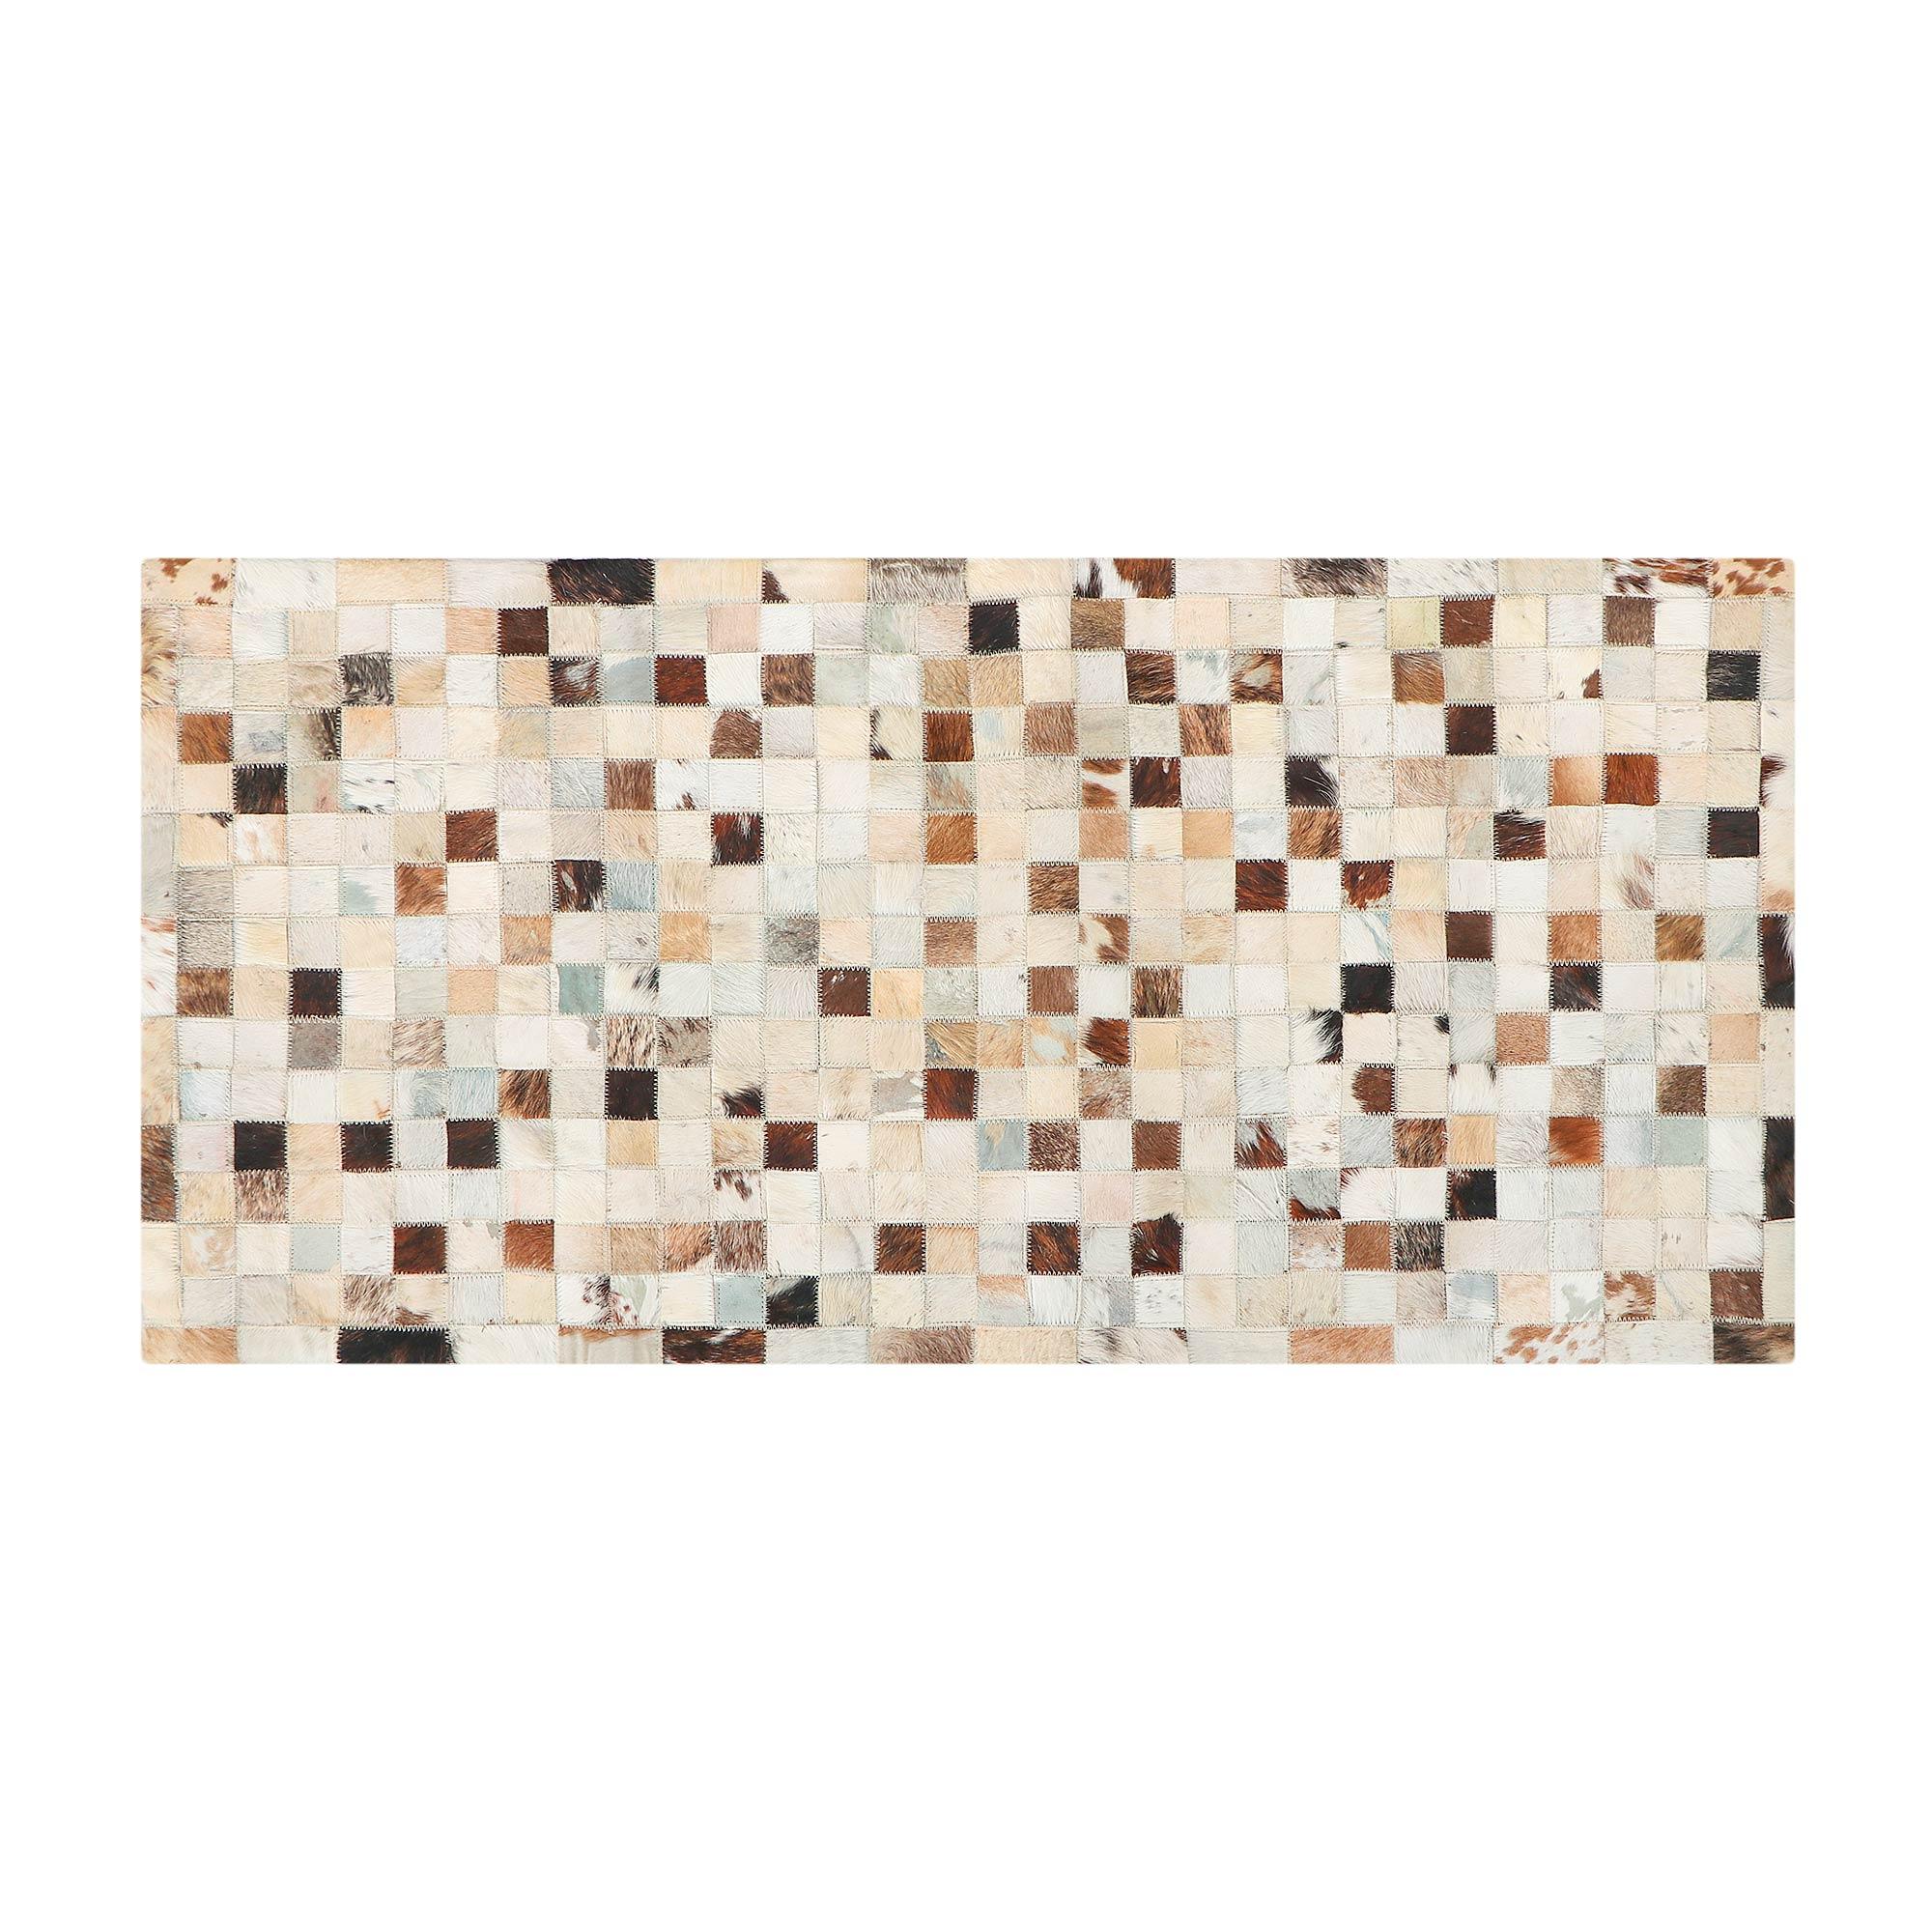 Фото - Коврик серый/бежевый Abc leather patchwork 120x60 коврик серый 80x50 abc la cucina zen